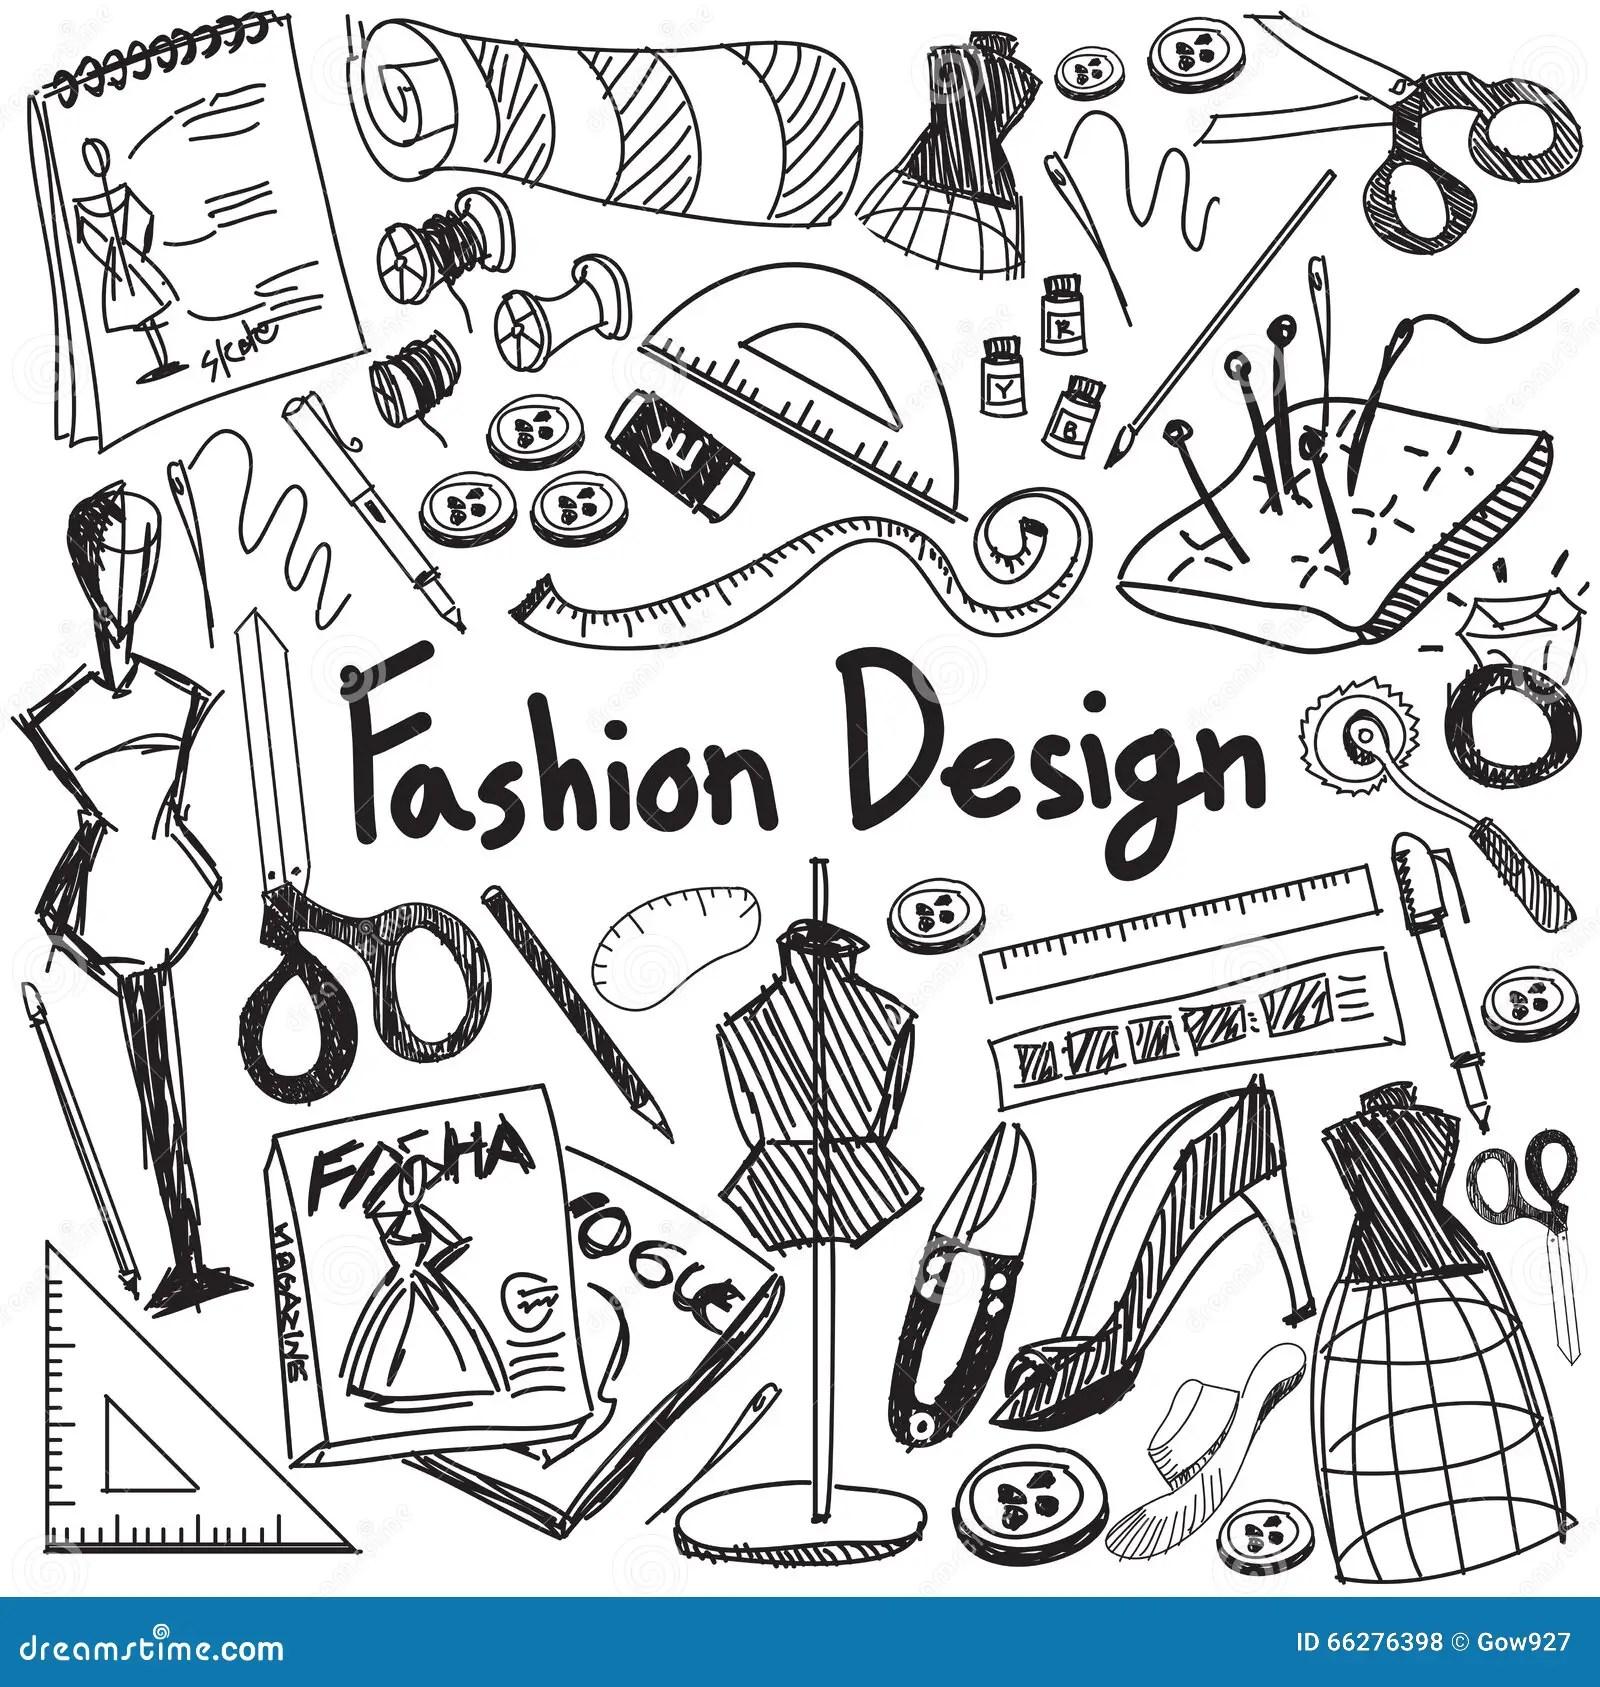 Fashion Design Education Handwriting Doodle Icon Tool Sign